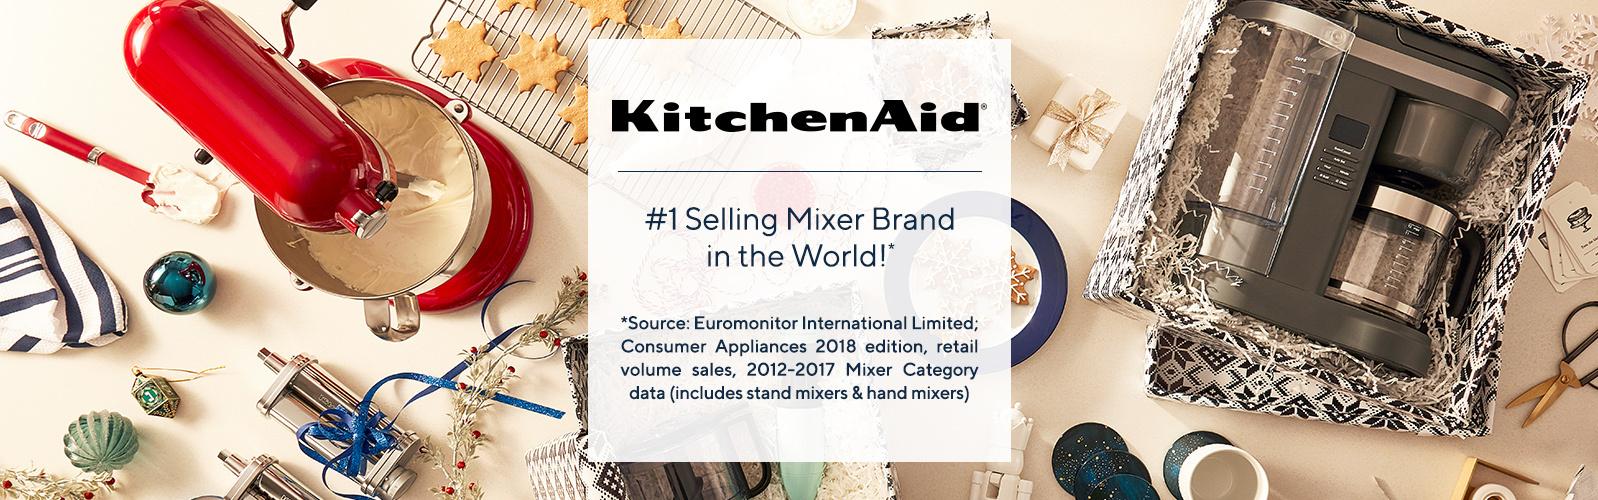 Kitchenaid Kitchenaid Appliances Amp Accessories Qvc Com